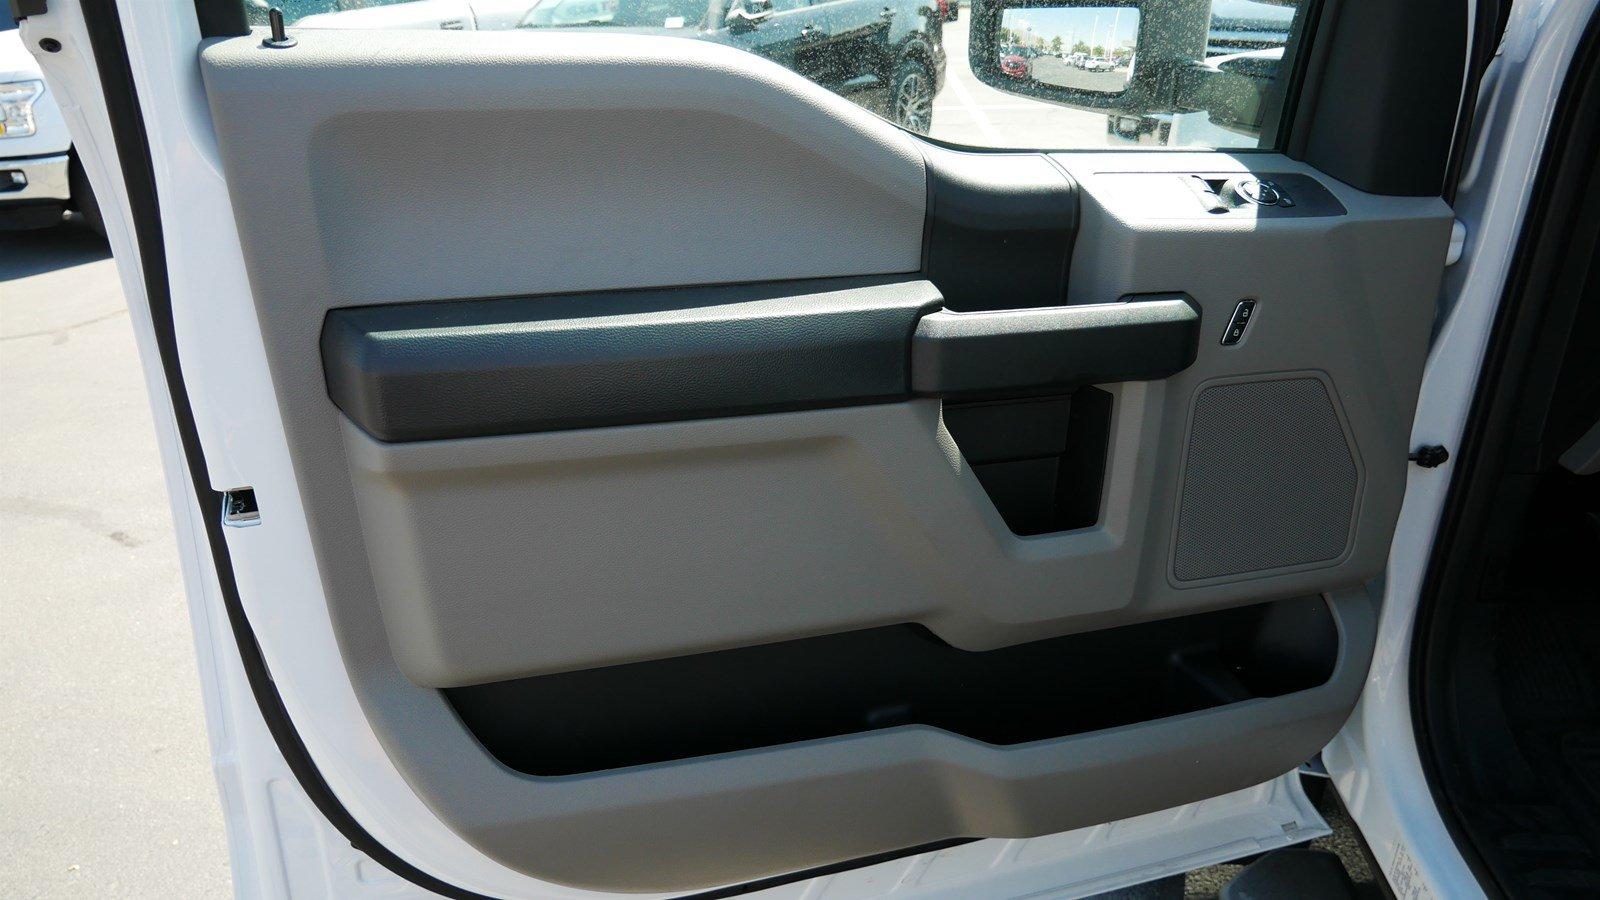 2019 F-550 Regular Cab DRW 4x4,  Scelzi Contractor Body #69285 - photo 10